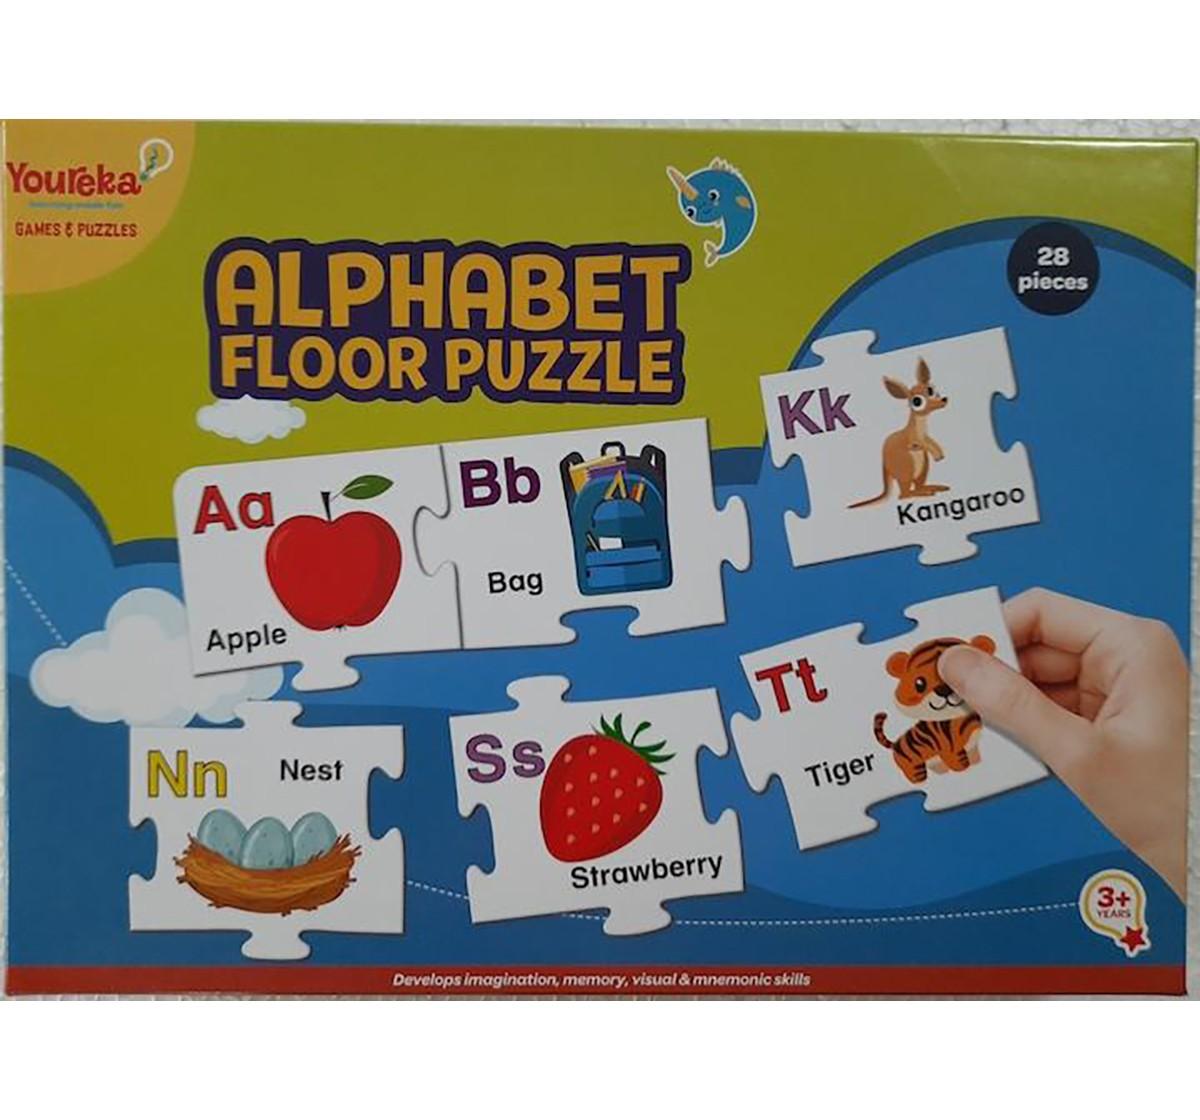 Youreka Alphabet Floor Puzzles for Kids age 3Y+